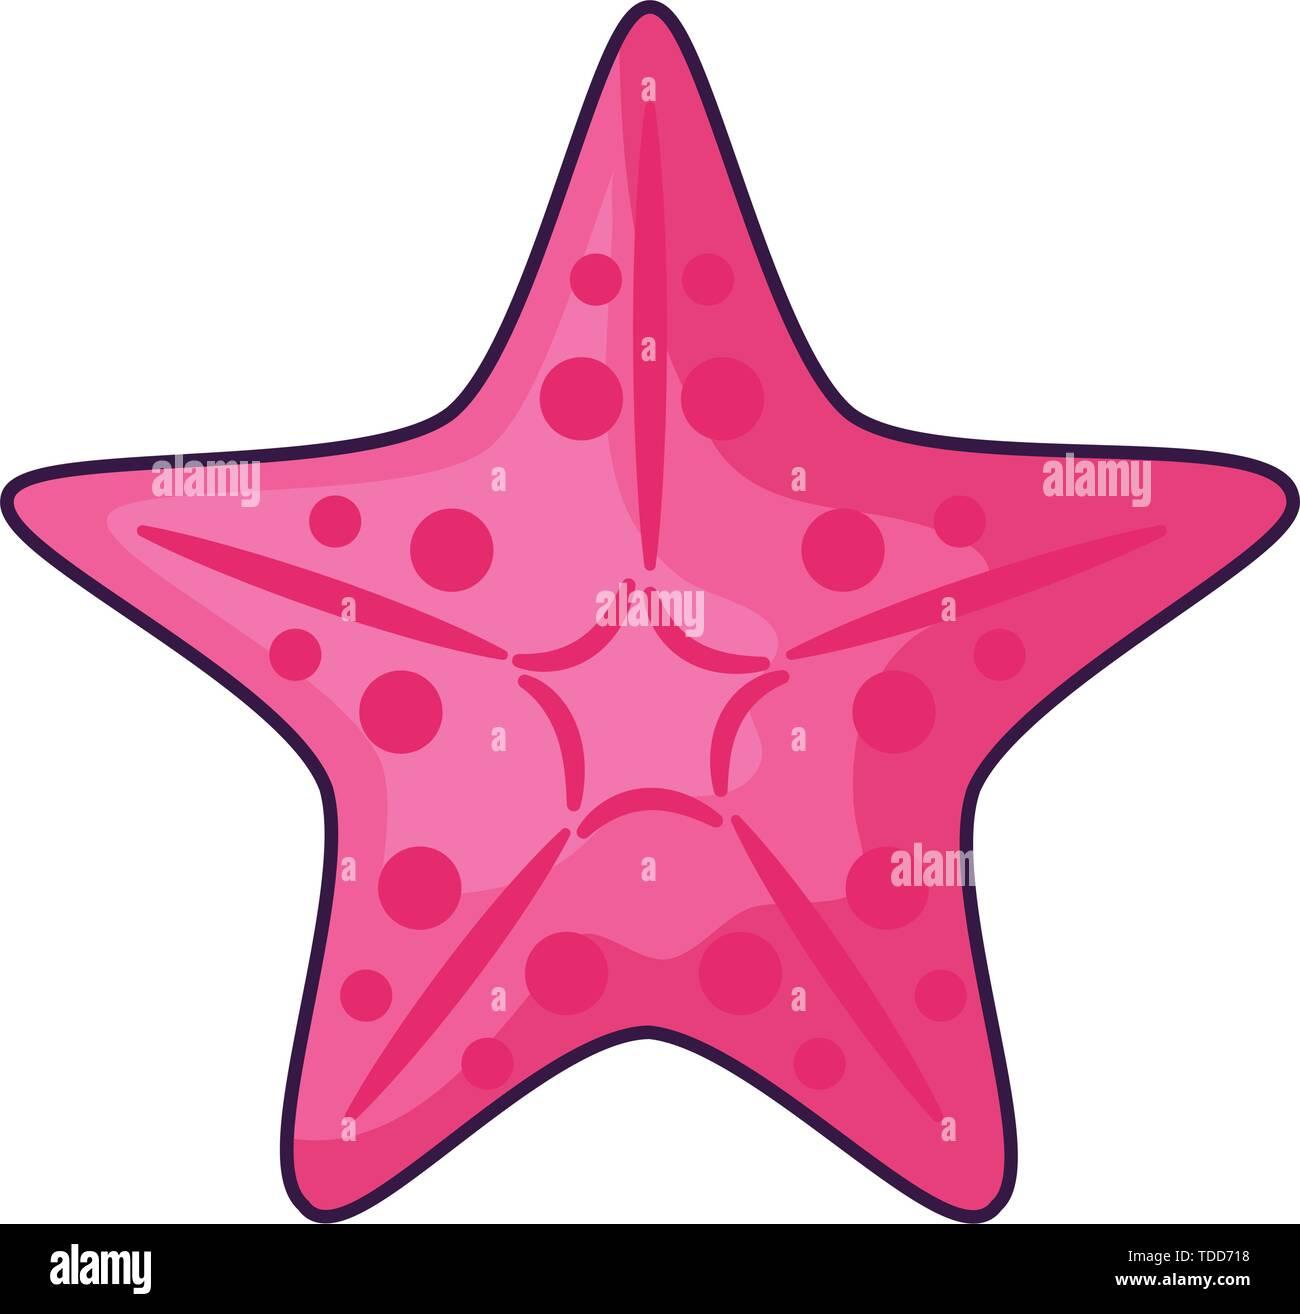 cute starfish animal isolated icon vector illustration design - Stock Image